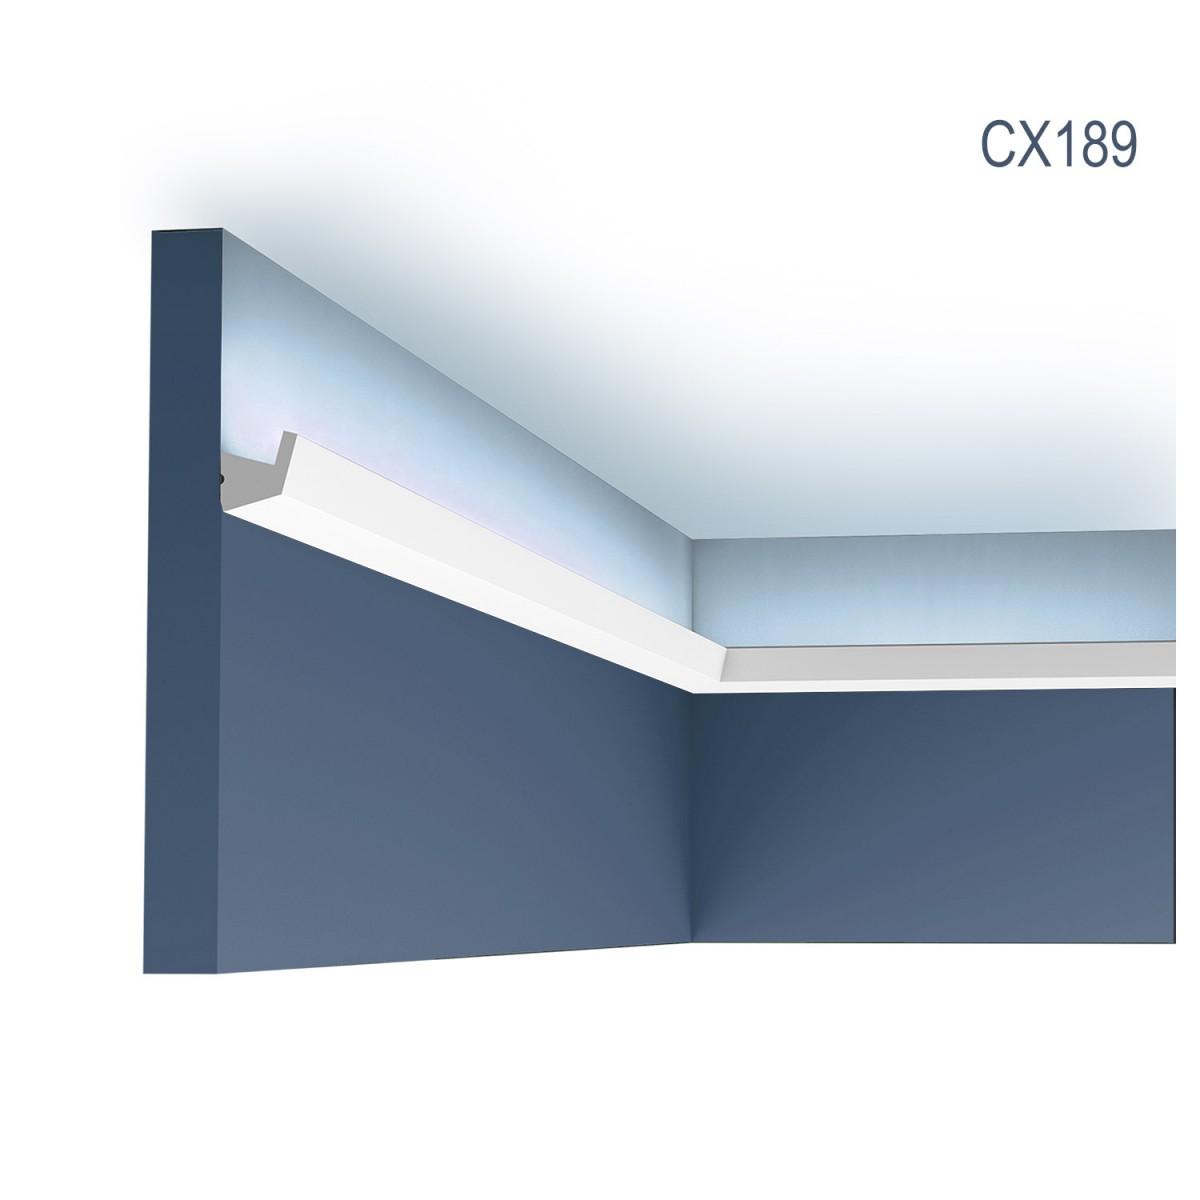 Cornisa Axxent CX189, Dimensiuni: 200 X 2.7 X 2.7 cm, Orac Decor